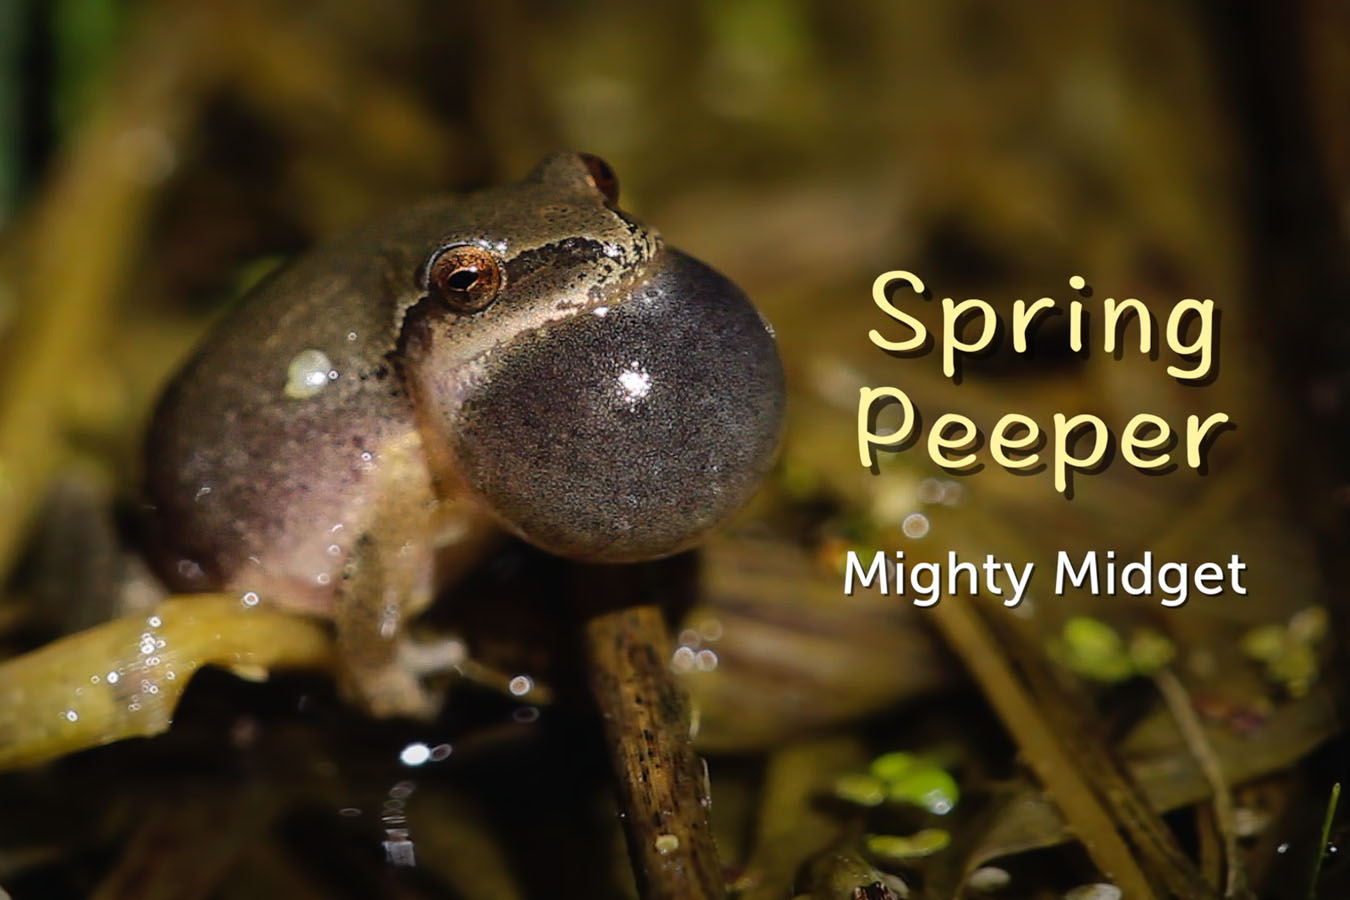 Spring Peeper - featured image © Lang Elliott